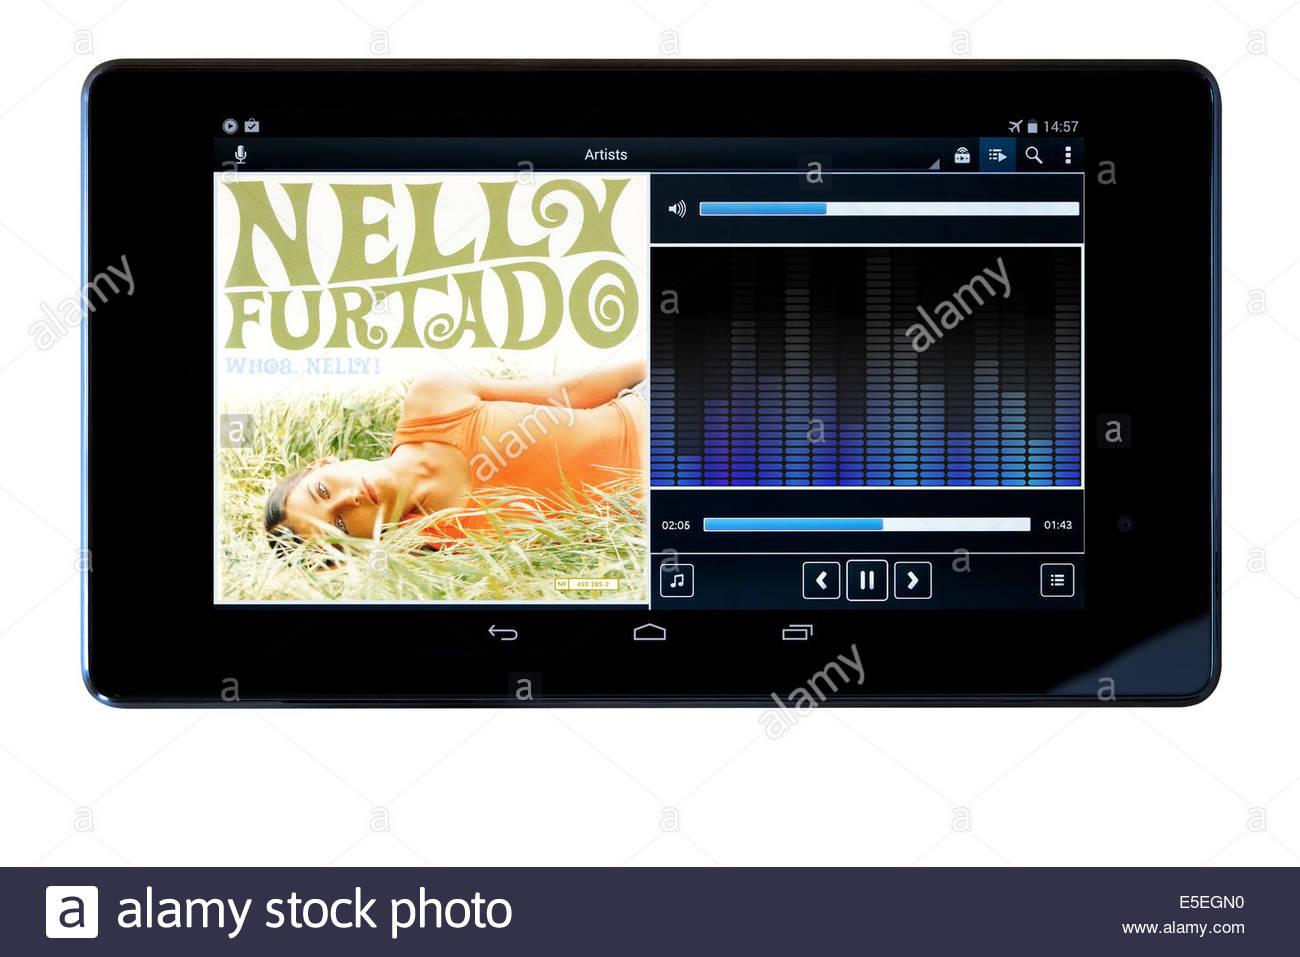 Nelly Furtado album, Whoa Nelly, MP3 album art on PC tablet, England Stock Photo